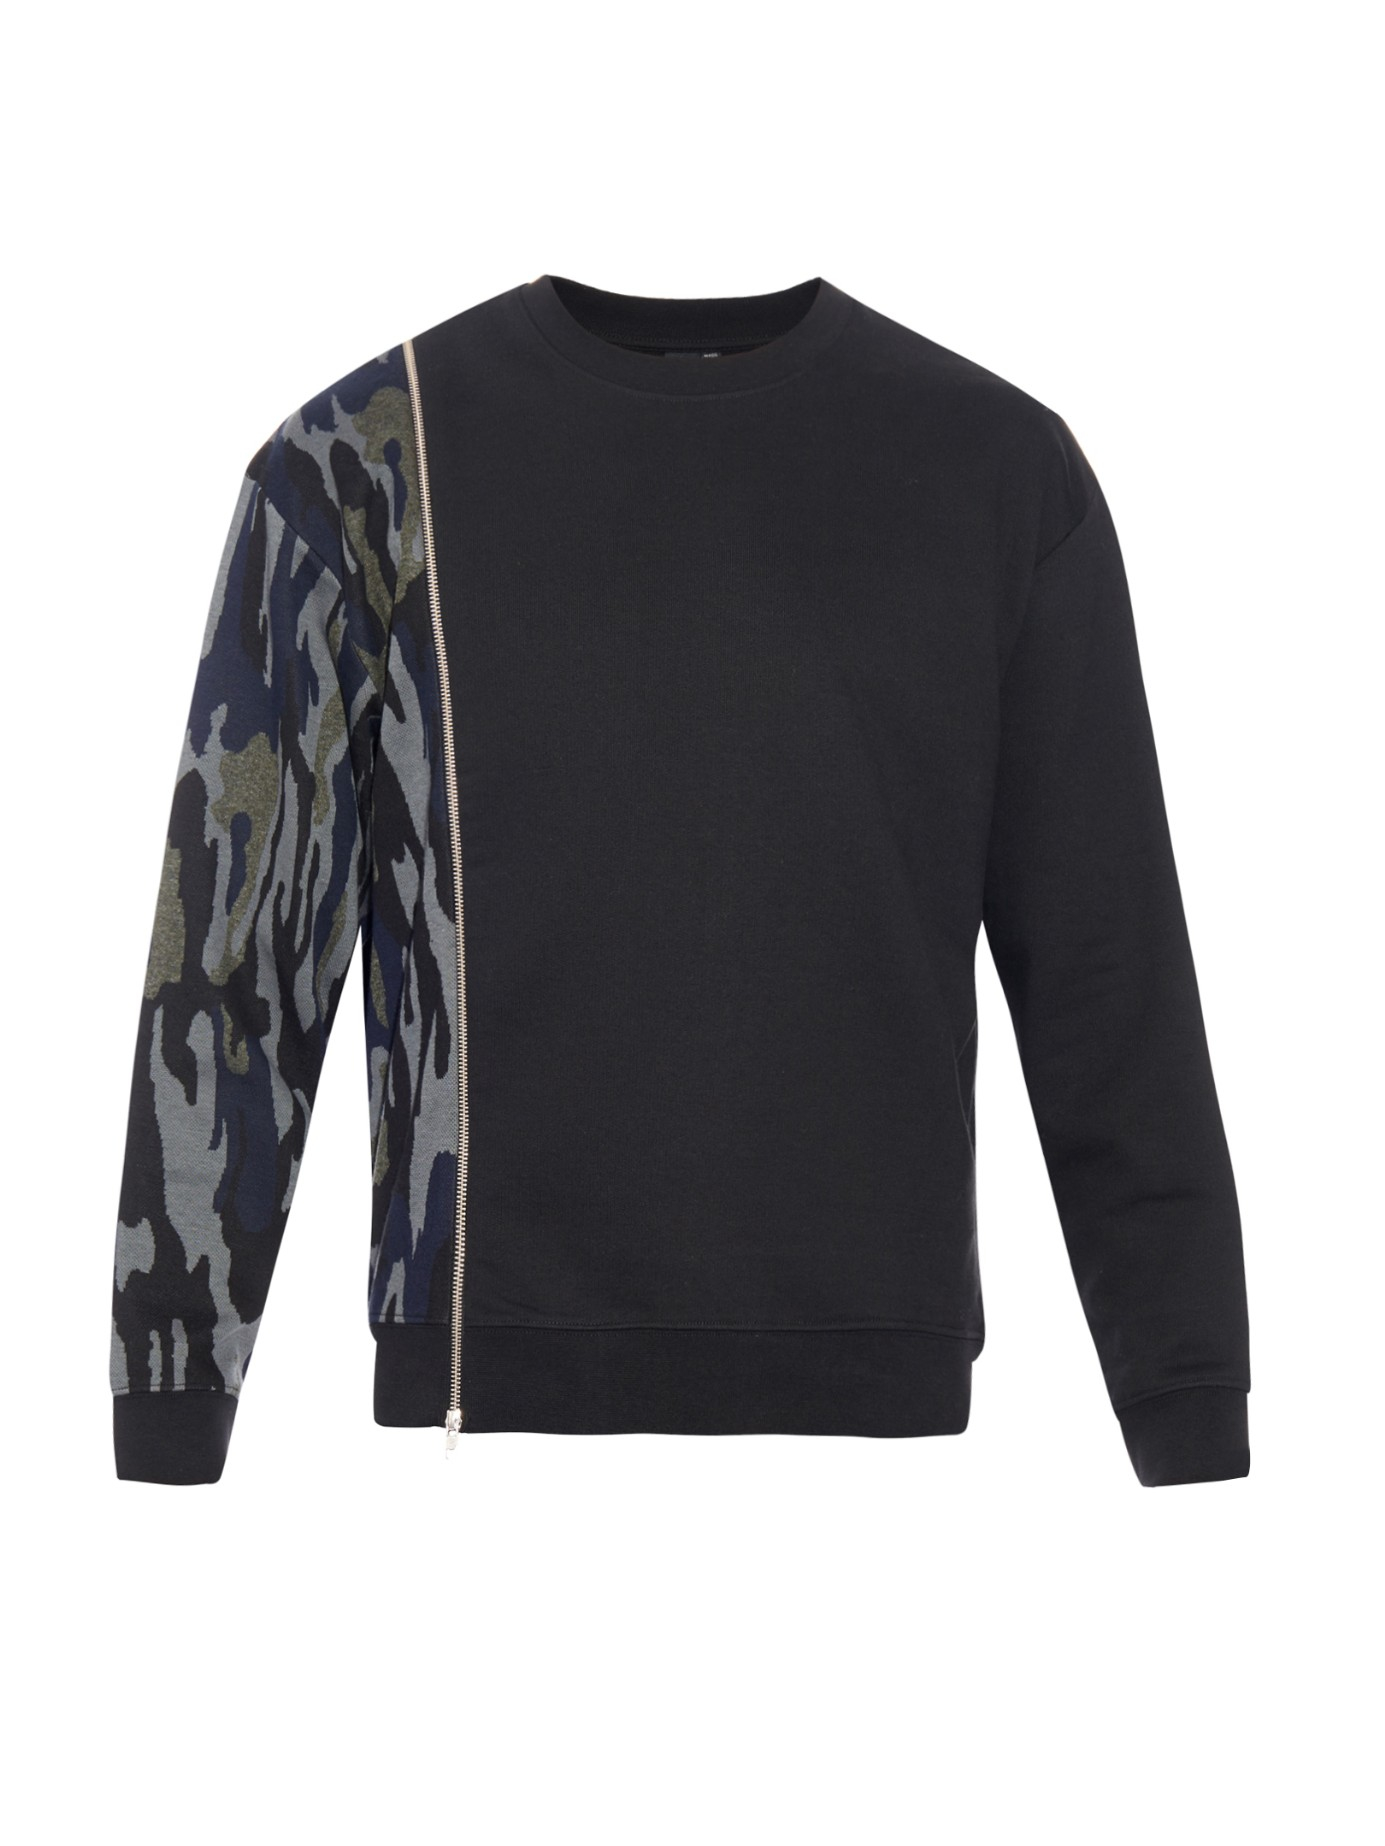 mcq by alexander mcqueen camouflage panel cotton blend sweatshirt in black for men lyst. Black Bedroom Furniture Sets. Home Design Ideas